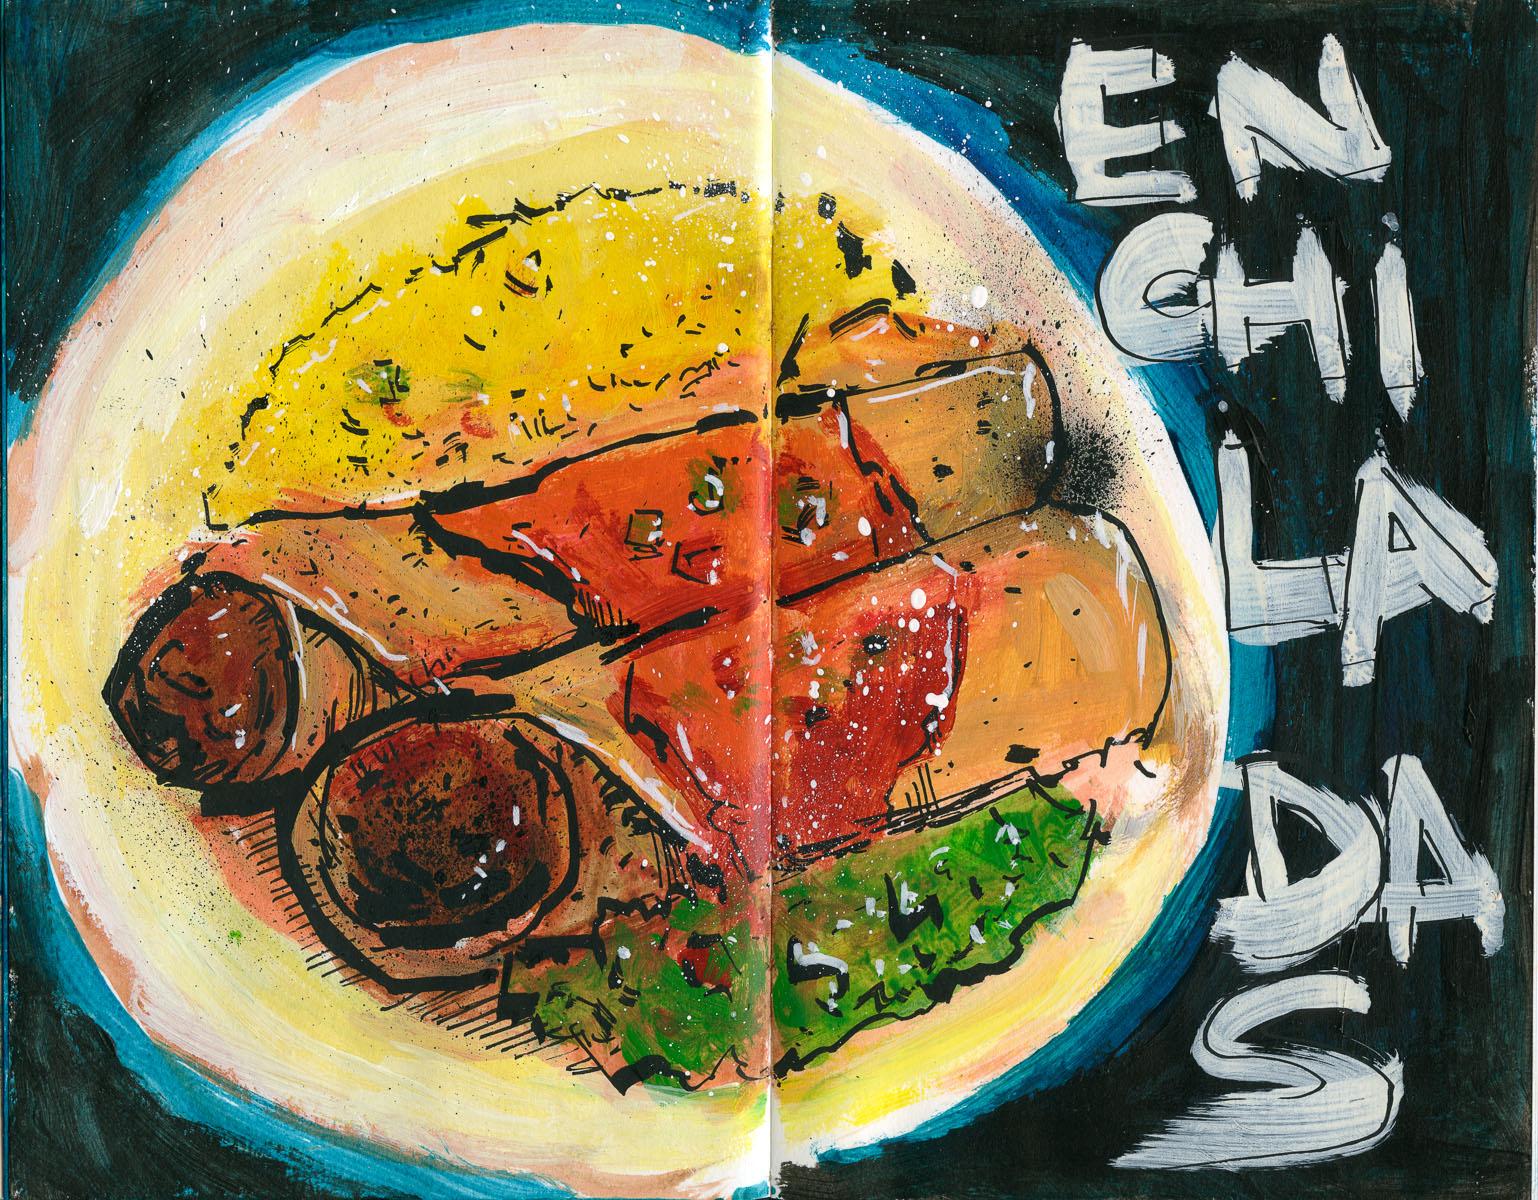 Cannon Pearson–Sketchbook: Enchiladas